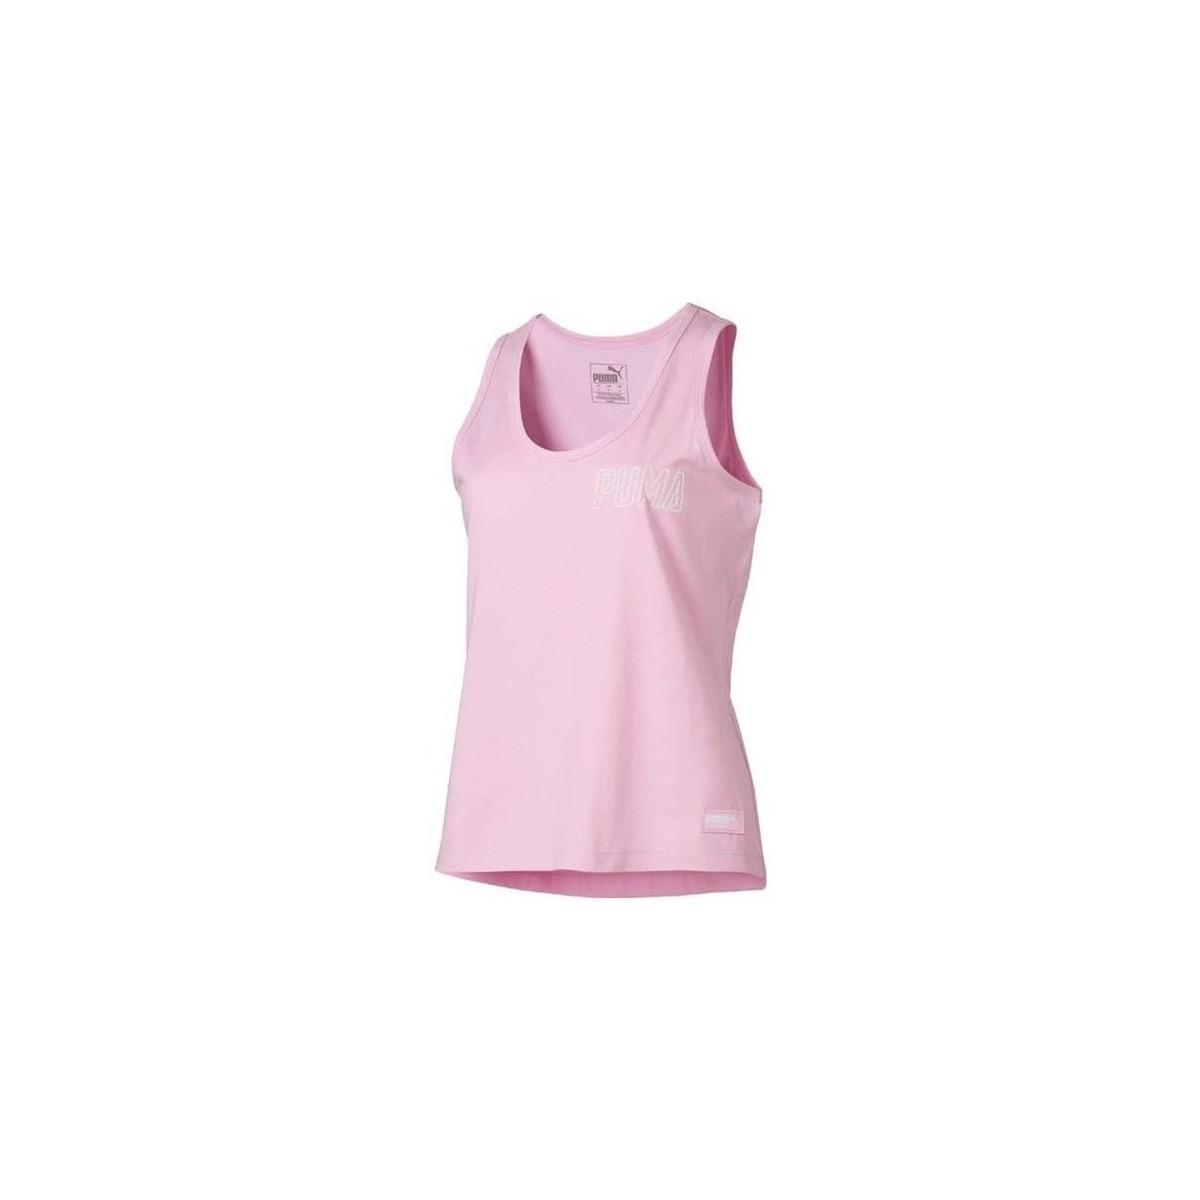 Toppe / T-shirts uden ærmer Puma  Athletics Tank